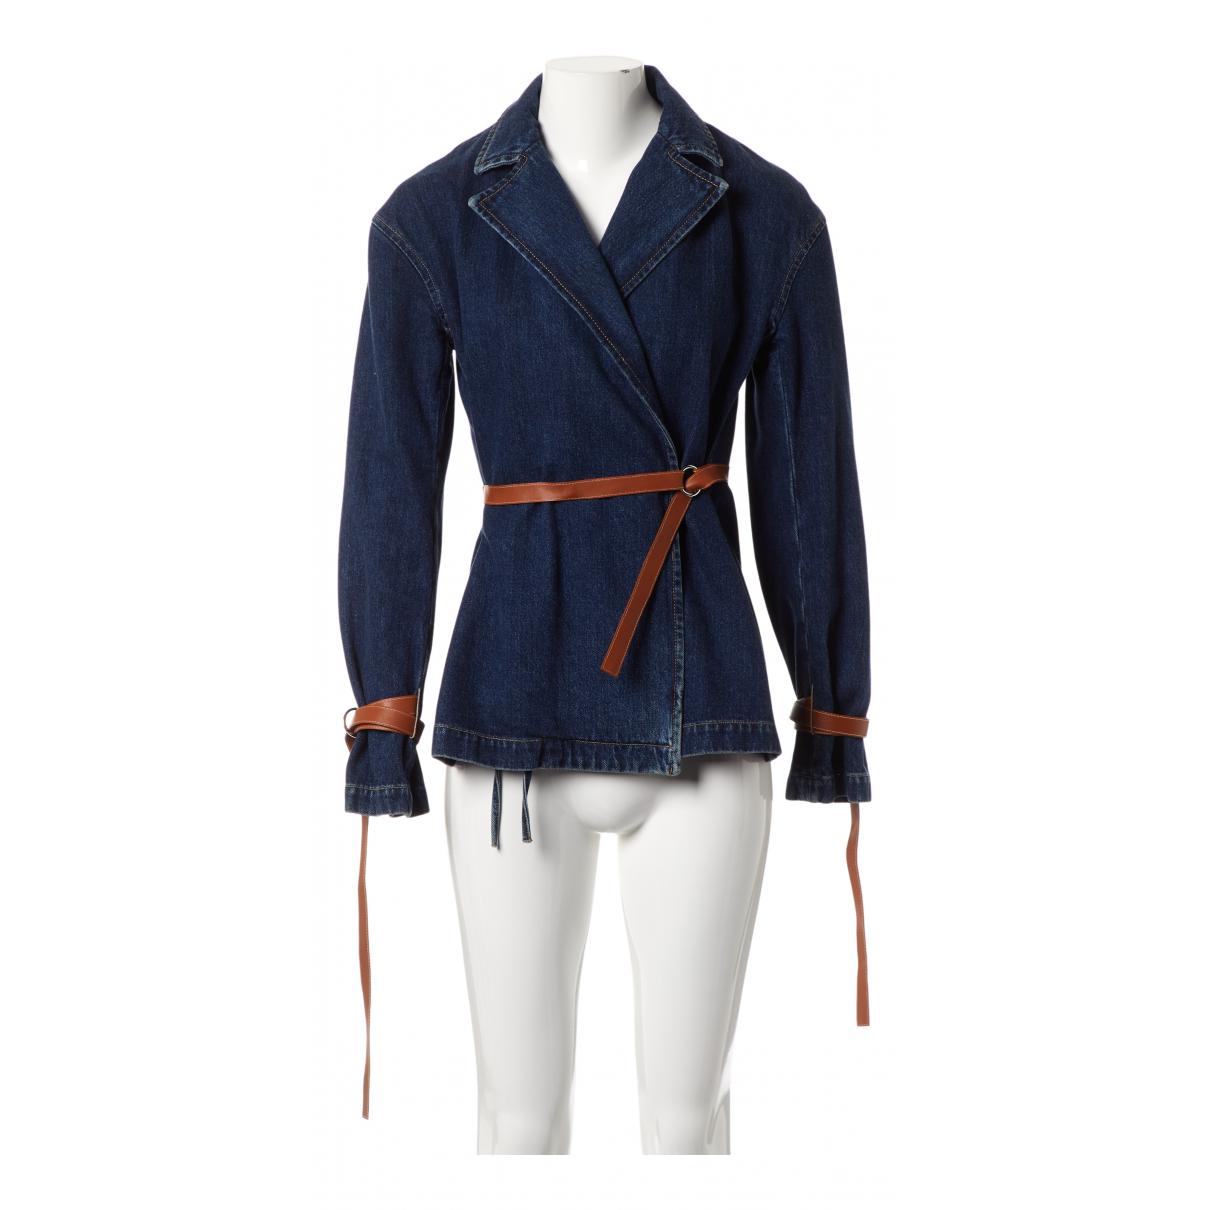 Loewe N Blue Denim - Jeans jacket for Women 36 FR